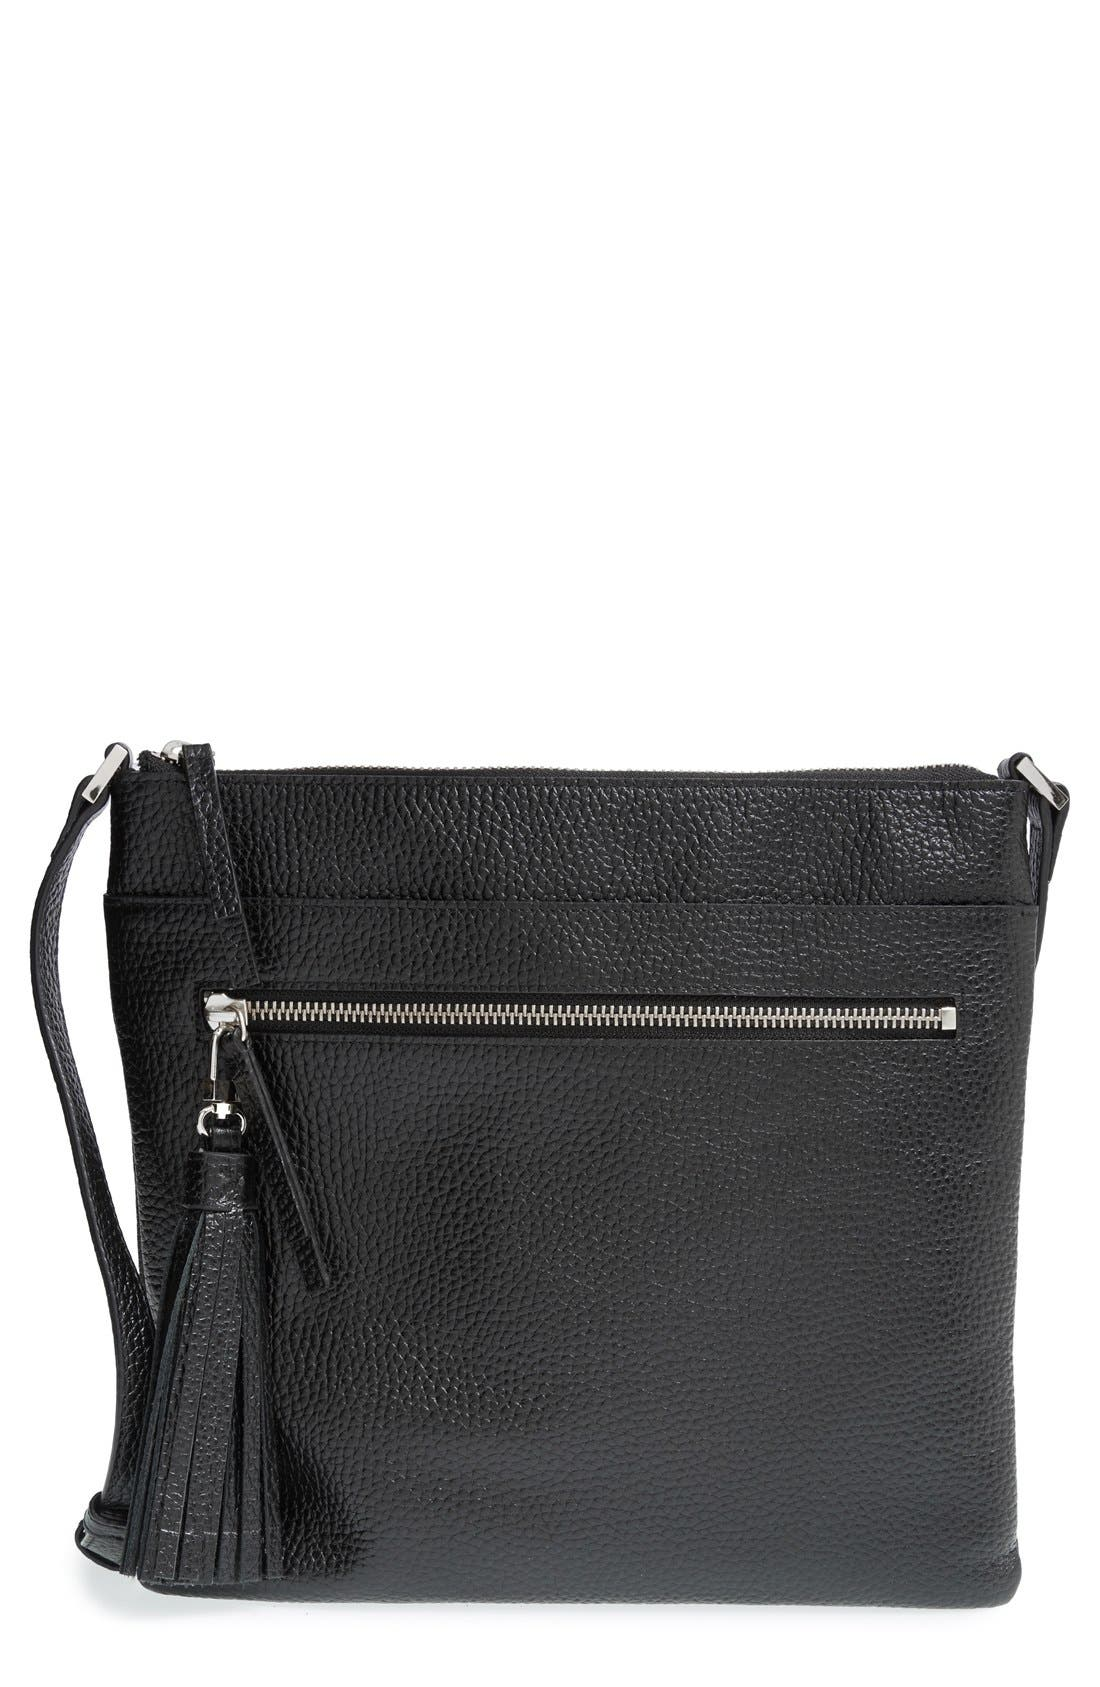 HALOGEN<SUP>®</SUP> Tasseled Leather Crossbody Bag, Main, color, 001